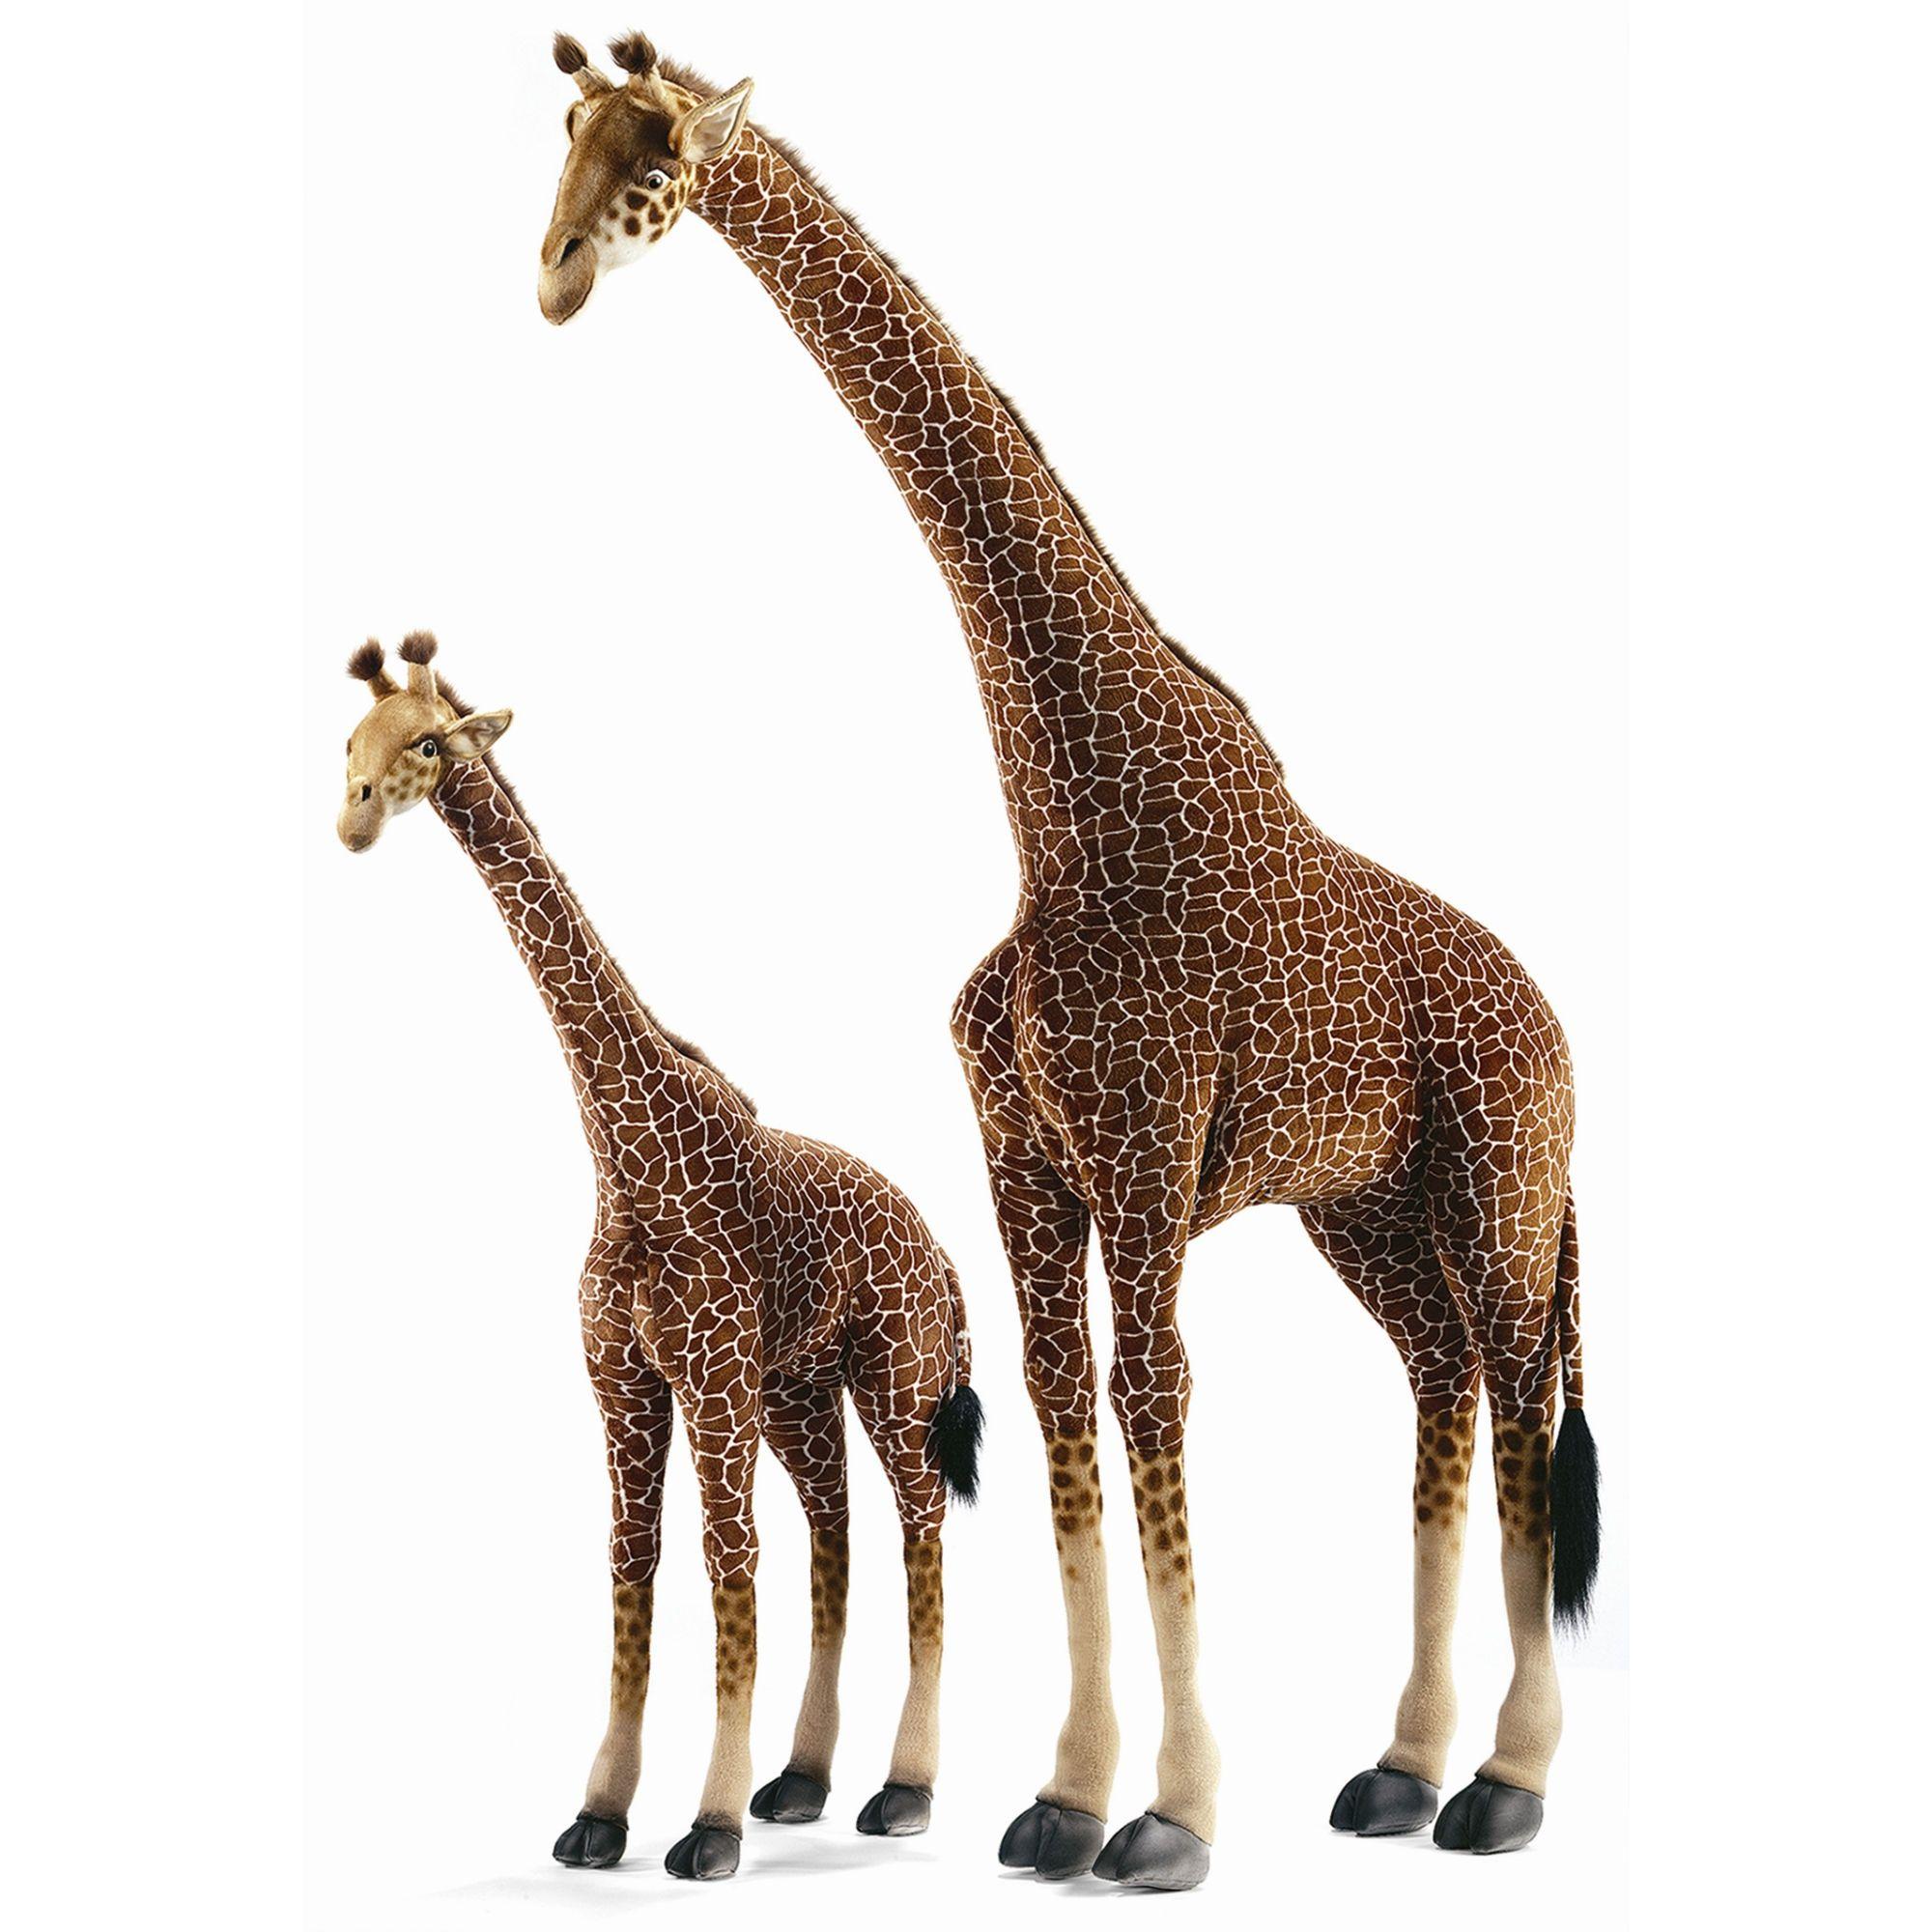 Hansa Life Size Giraffe Stuffed Animal Life Size Giraffe Giraffe Stuffed Animal Large Giraffe Stuffed Animal [ 2000 x 2000 Pixel ]